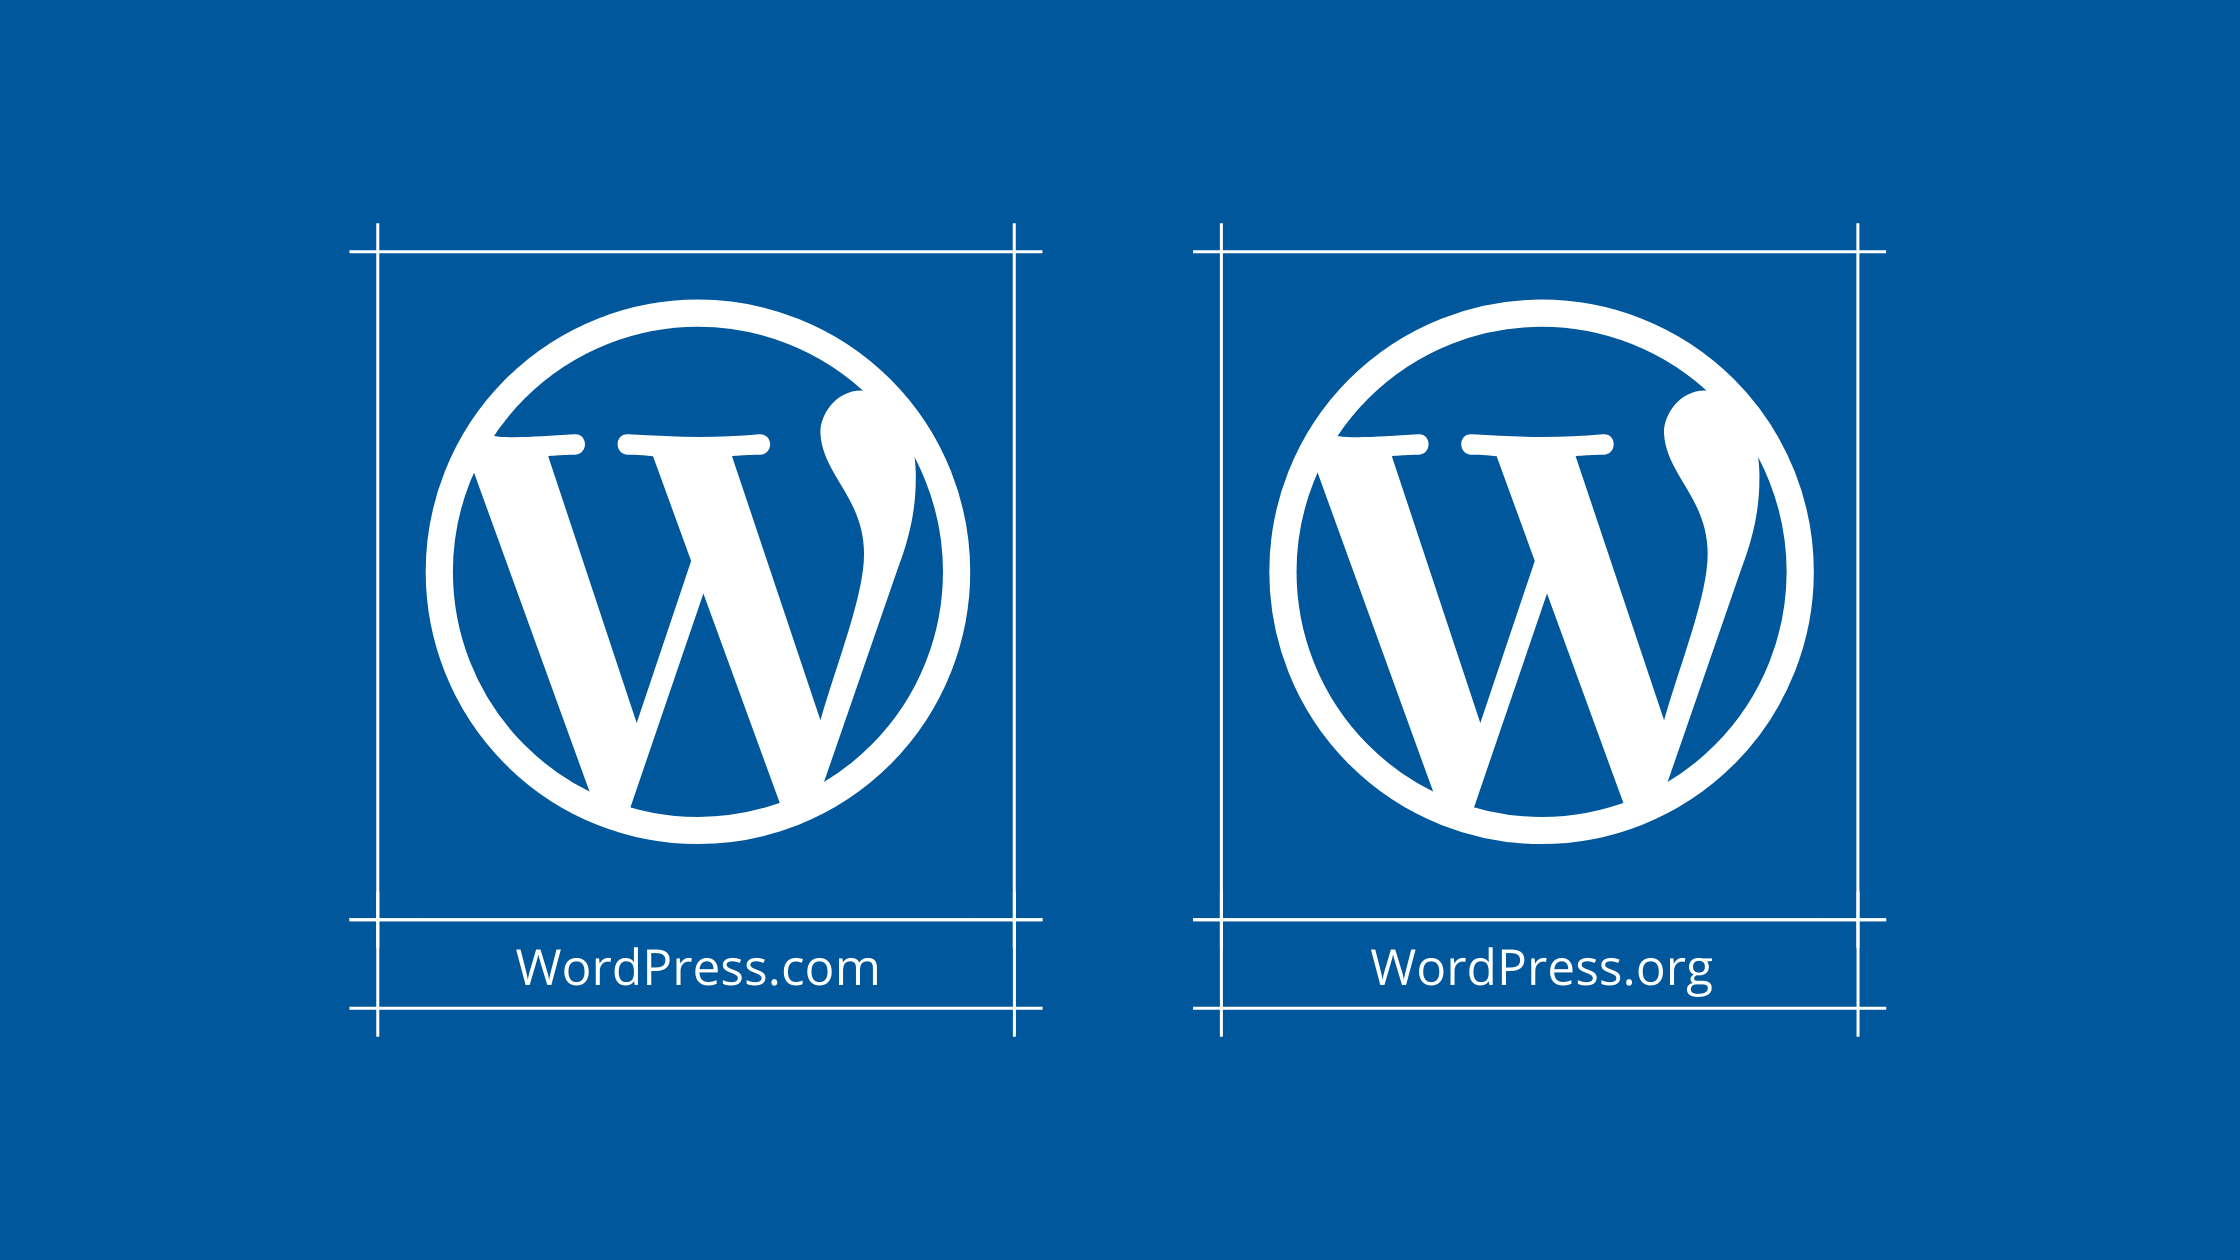 Difference Between WordPress.com vs WordPress.org